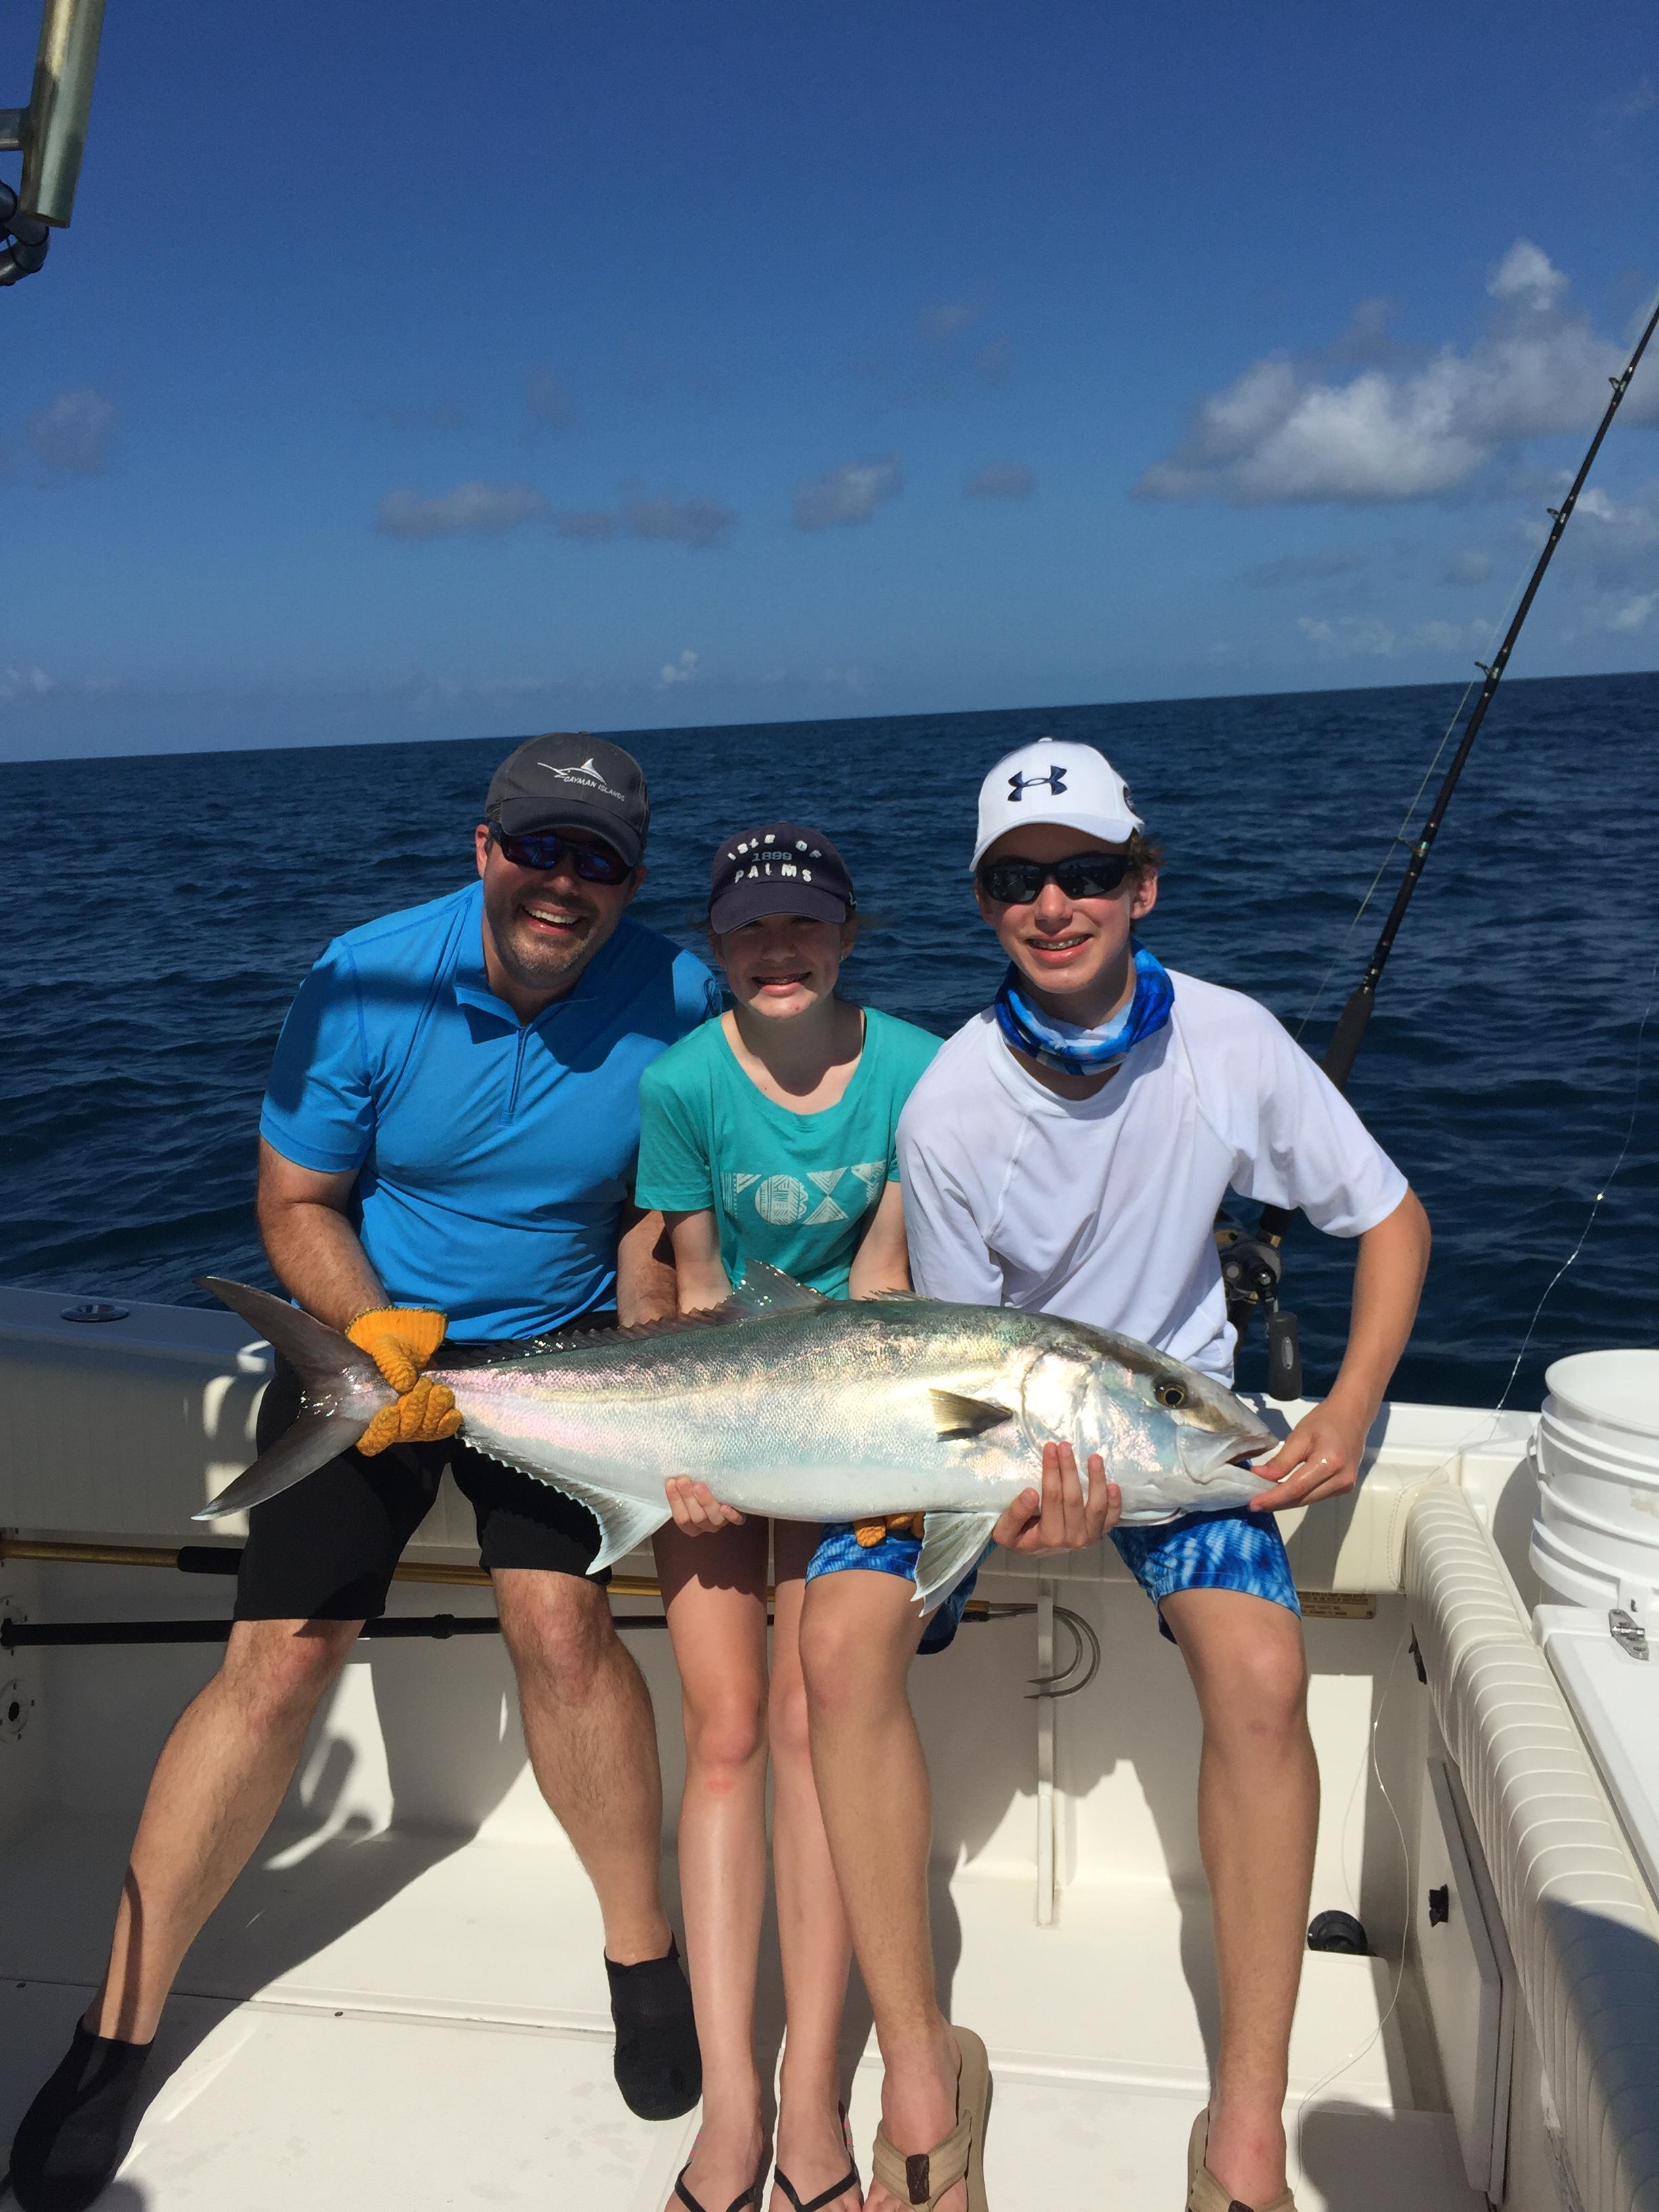 Amberjack catch 39 em all florida keys fishing charters for Florida keys fishing calendar